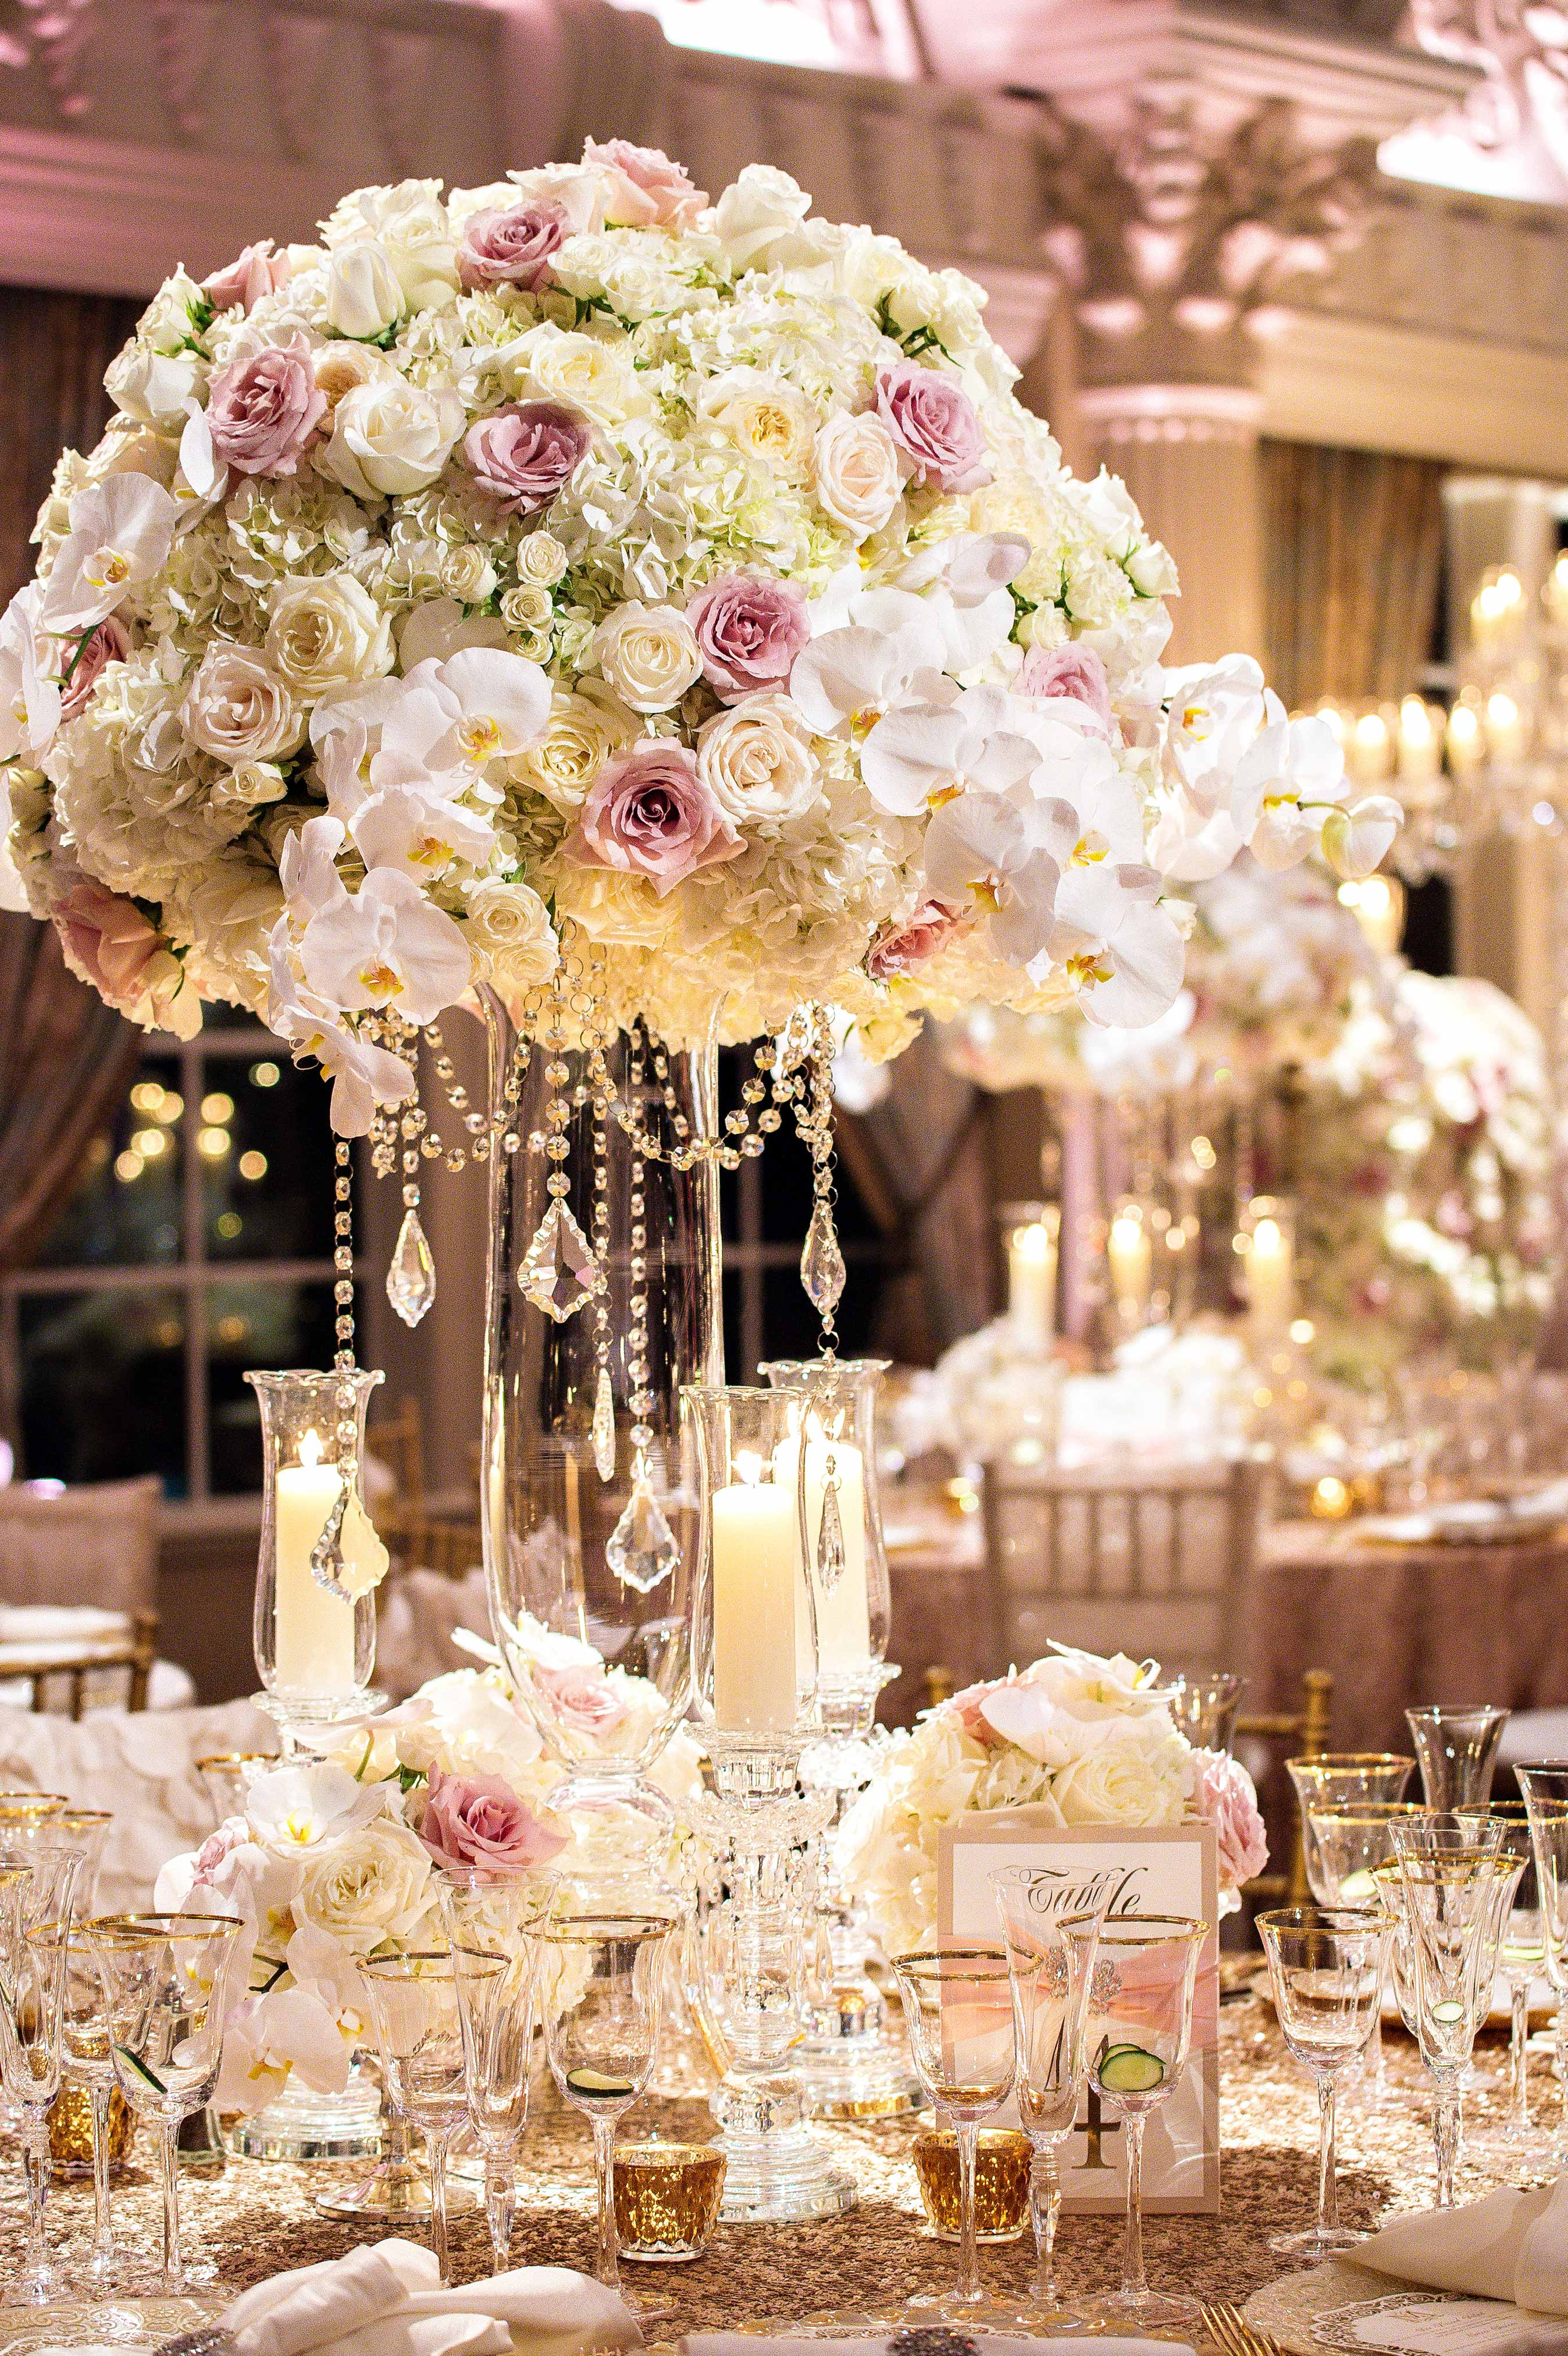 Tracy Morgan wedding reception gold table linens glam decor